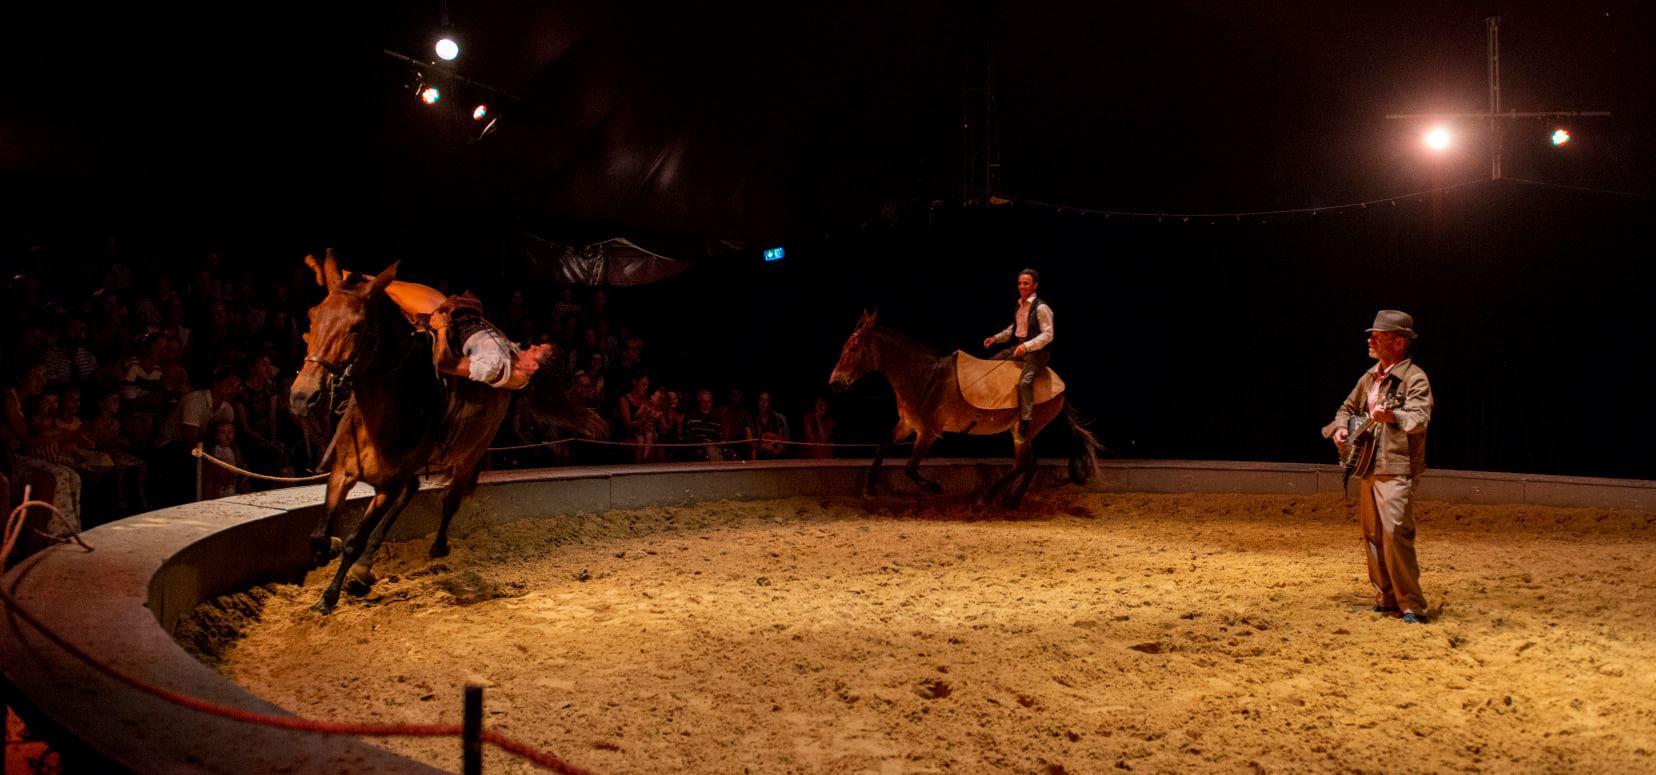 Voltige sur mule 2 .jpg